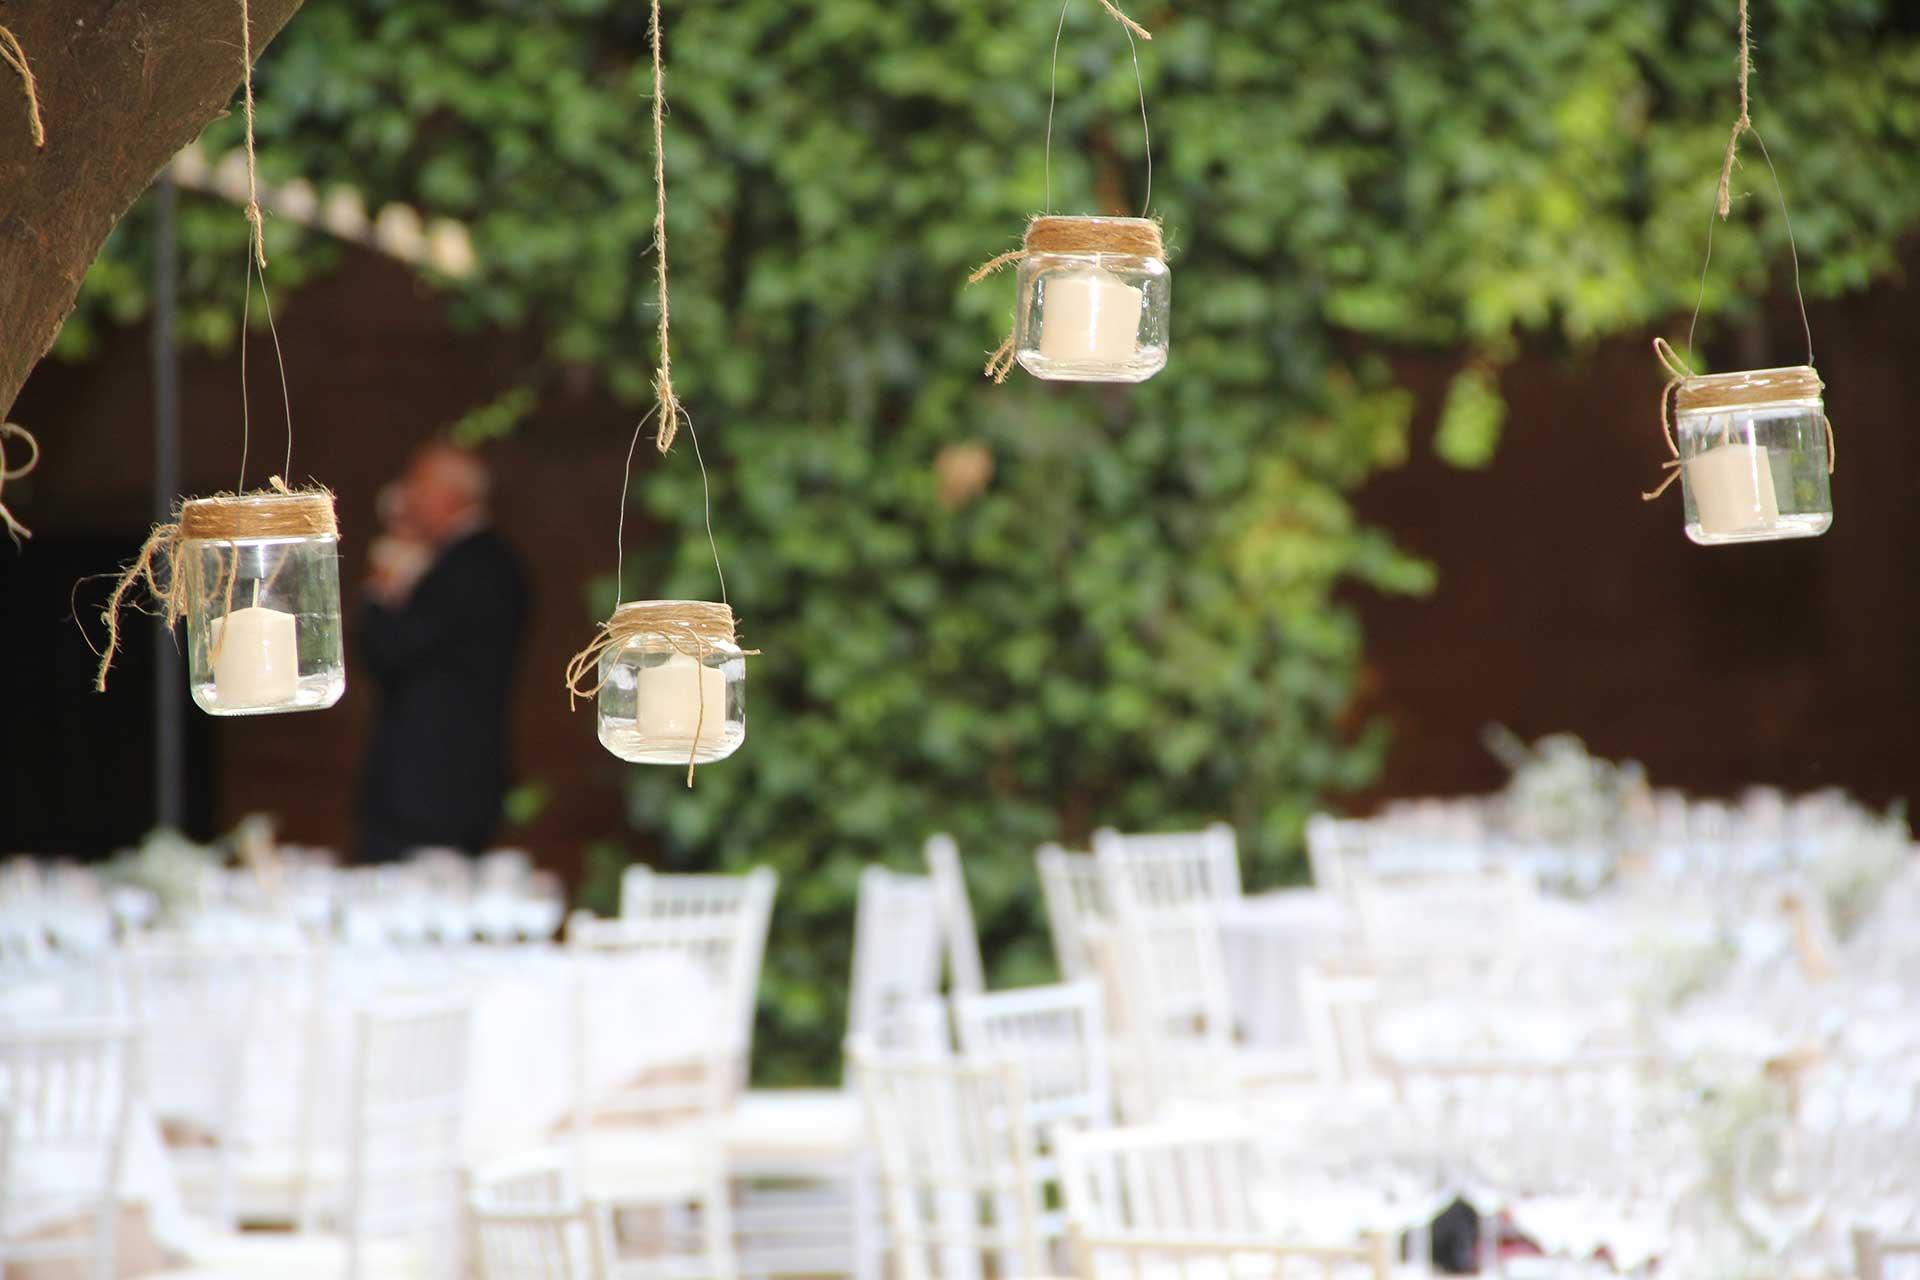 Lugar con encanto en Huelva, ideal para celebrar tu boda, lleno de sabor e historia